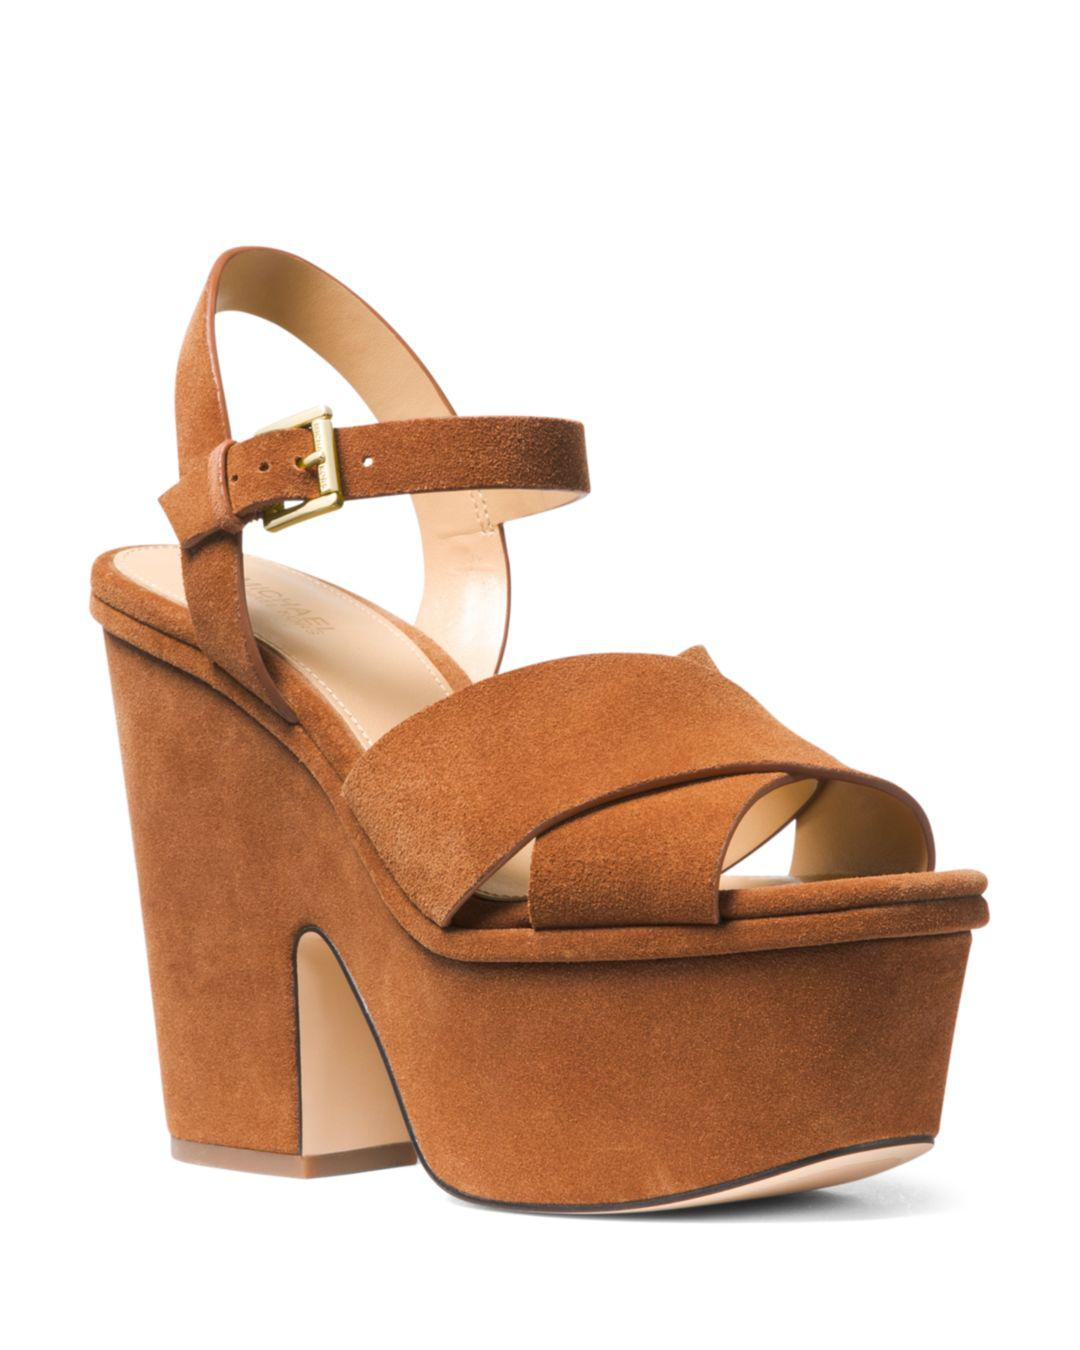 ce7afc2ab3 MICHAEL Michael Kors. Brown Women's Divia Open-toe Platform Suede Wedge  Heel Sandals